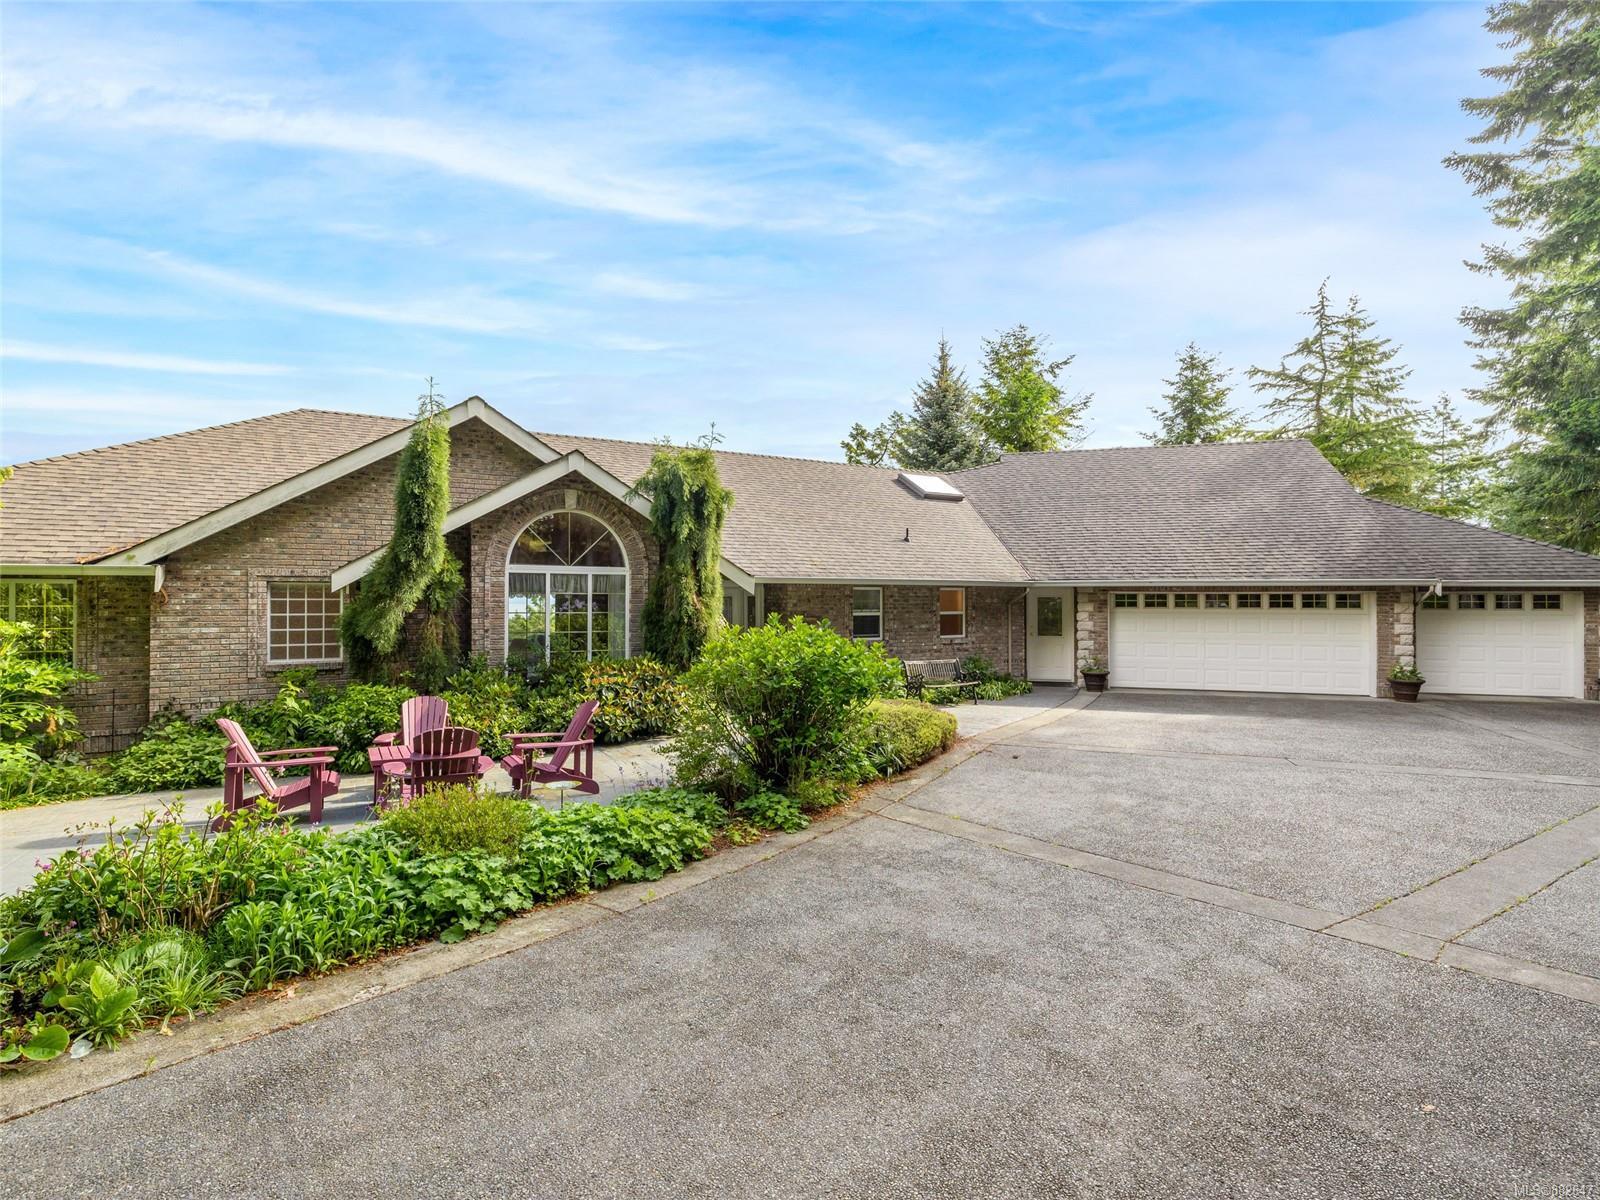 6620 David Place, Upper Lantzville, Nanaimo